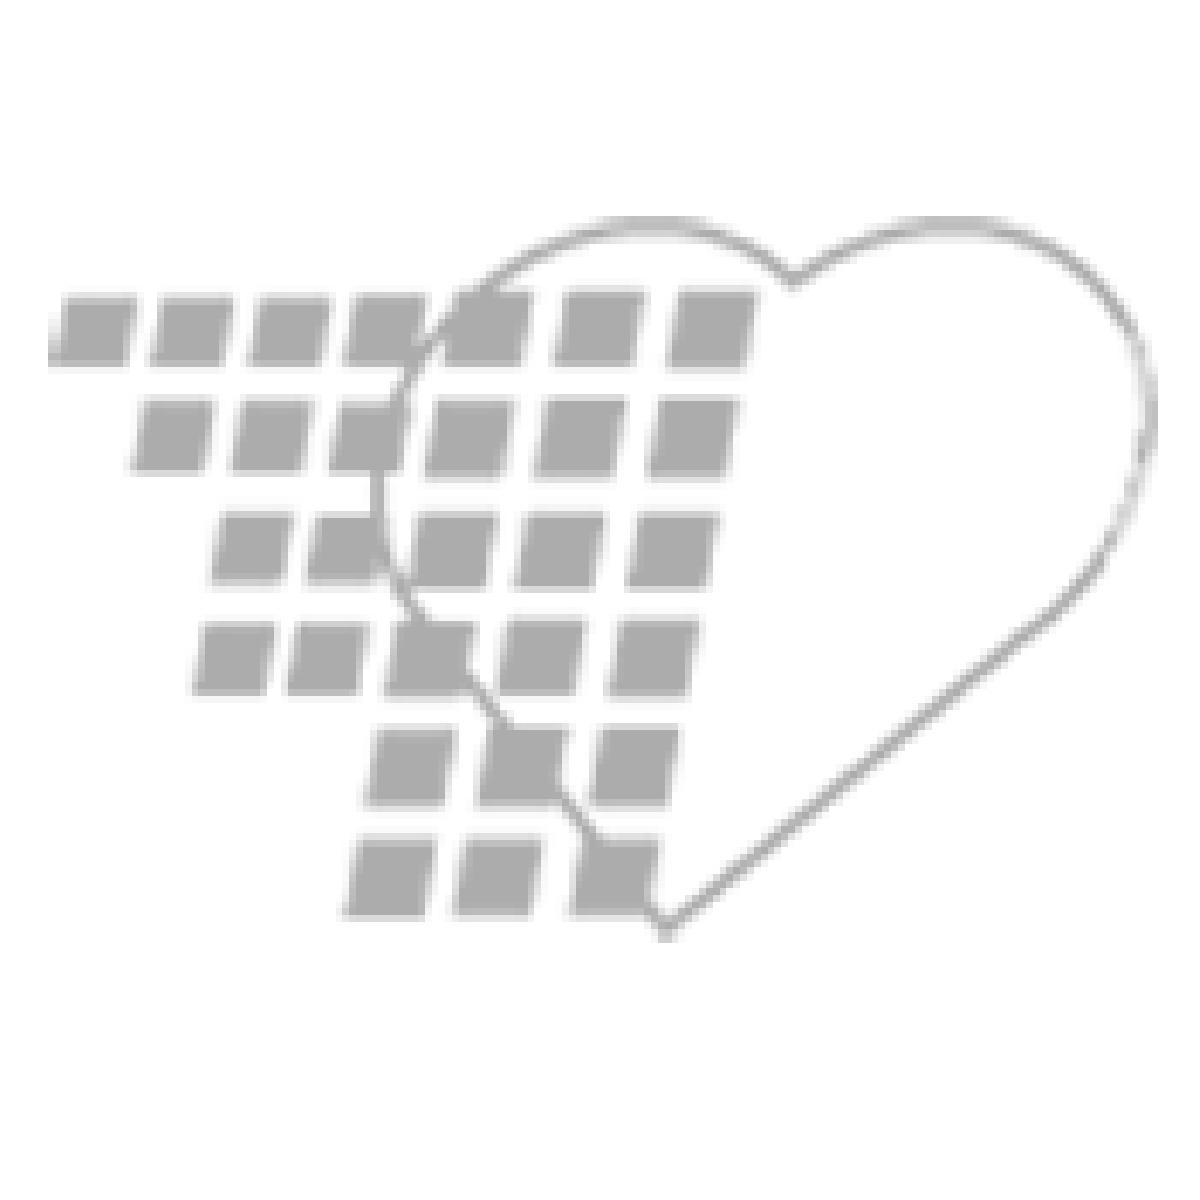 08-02-32 BD™ E-Z Scrub™ Preoperative Surgical Scrub Brush 107 with 4% CHG